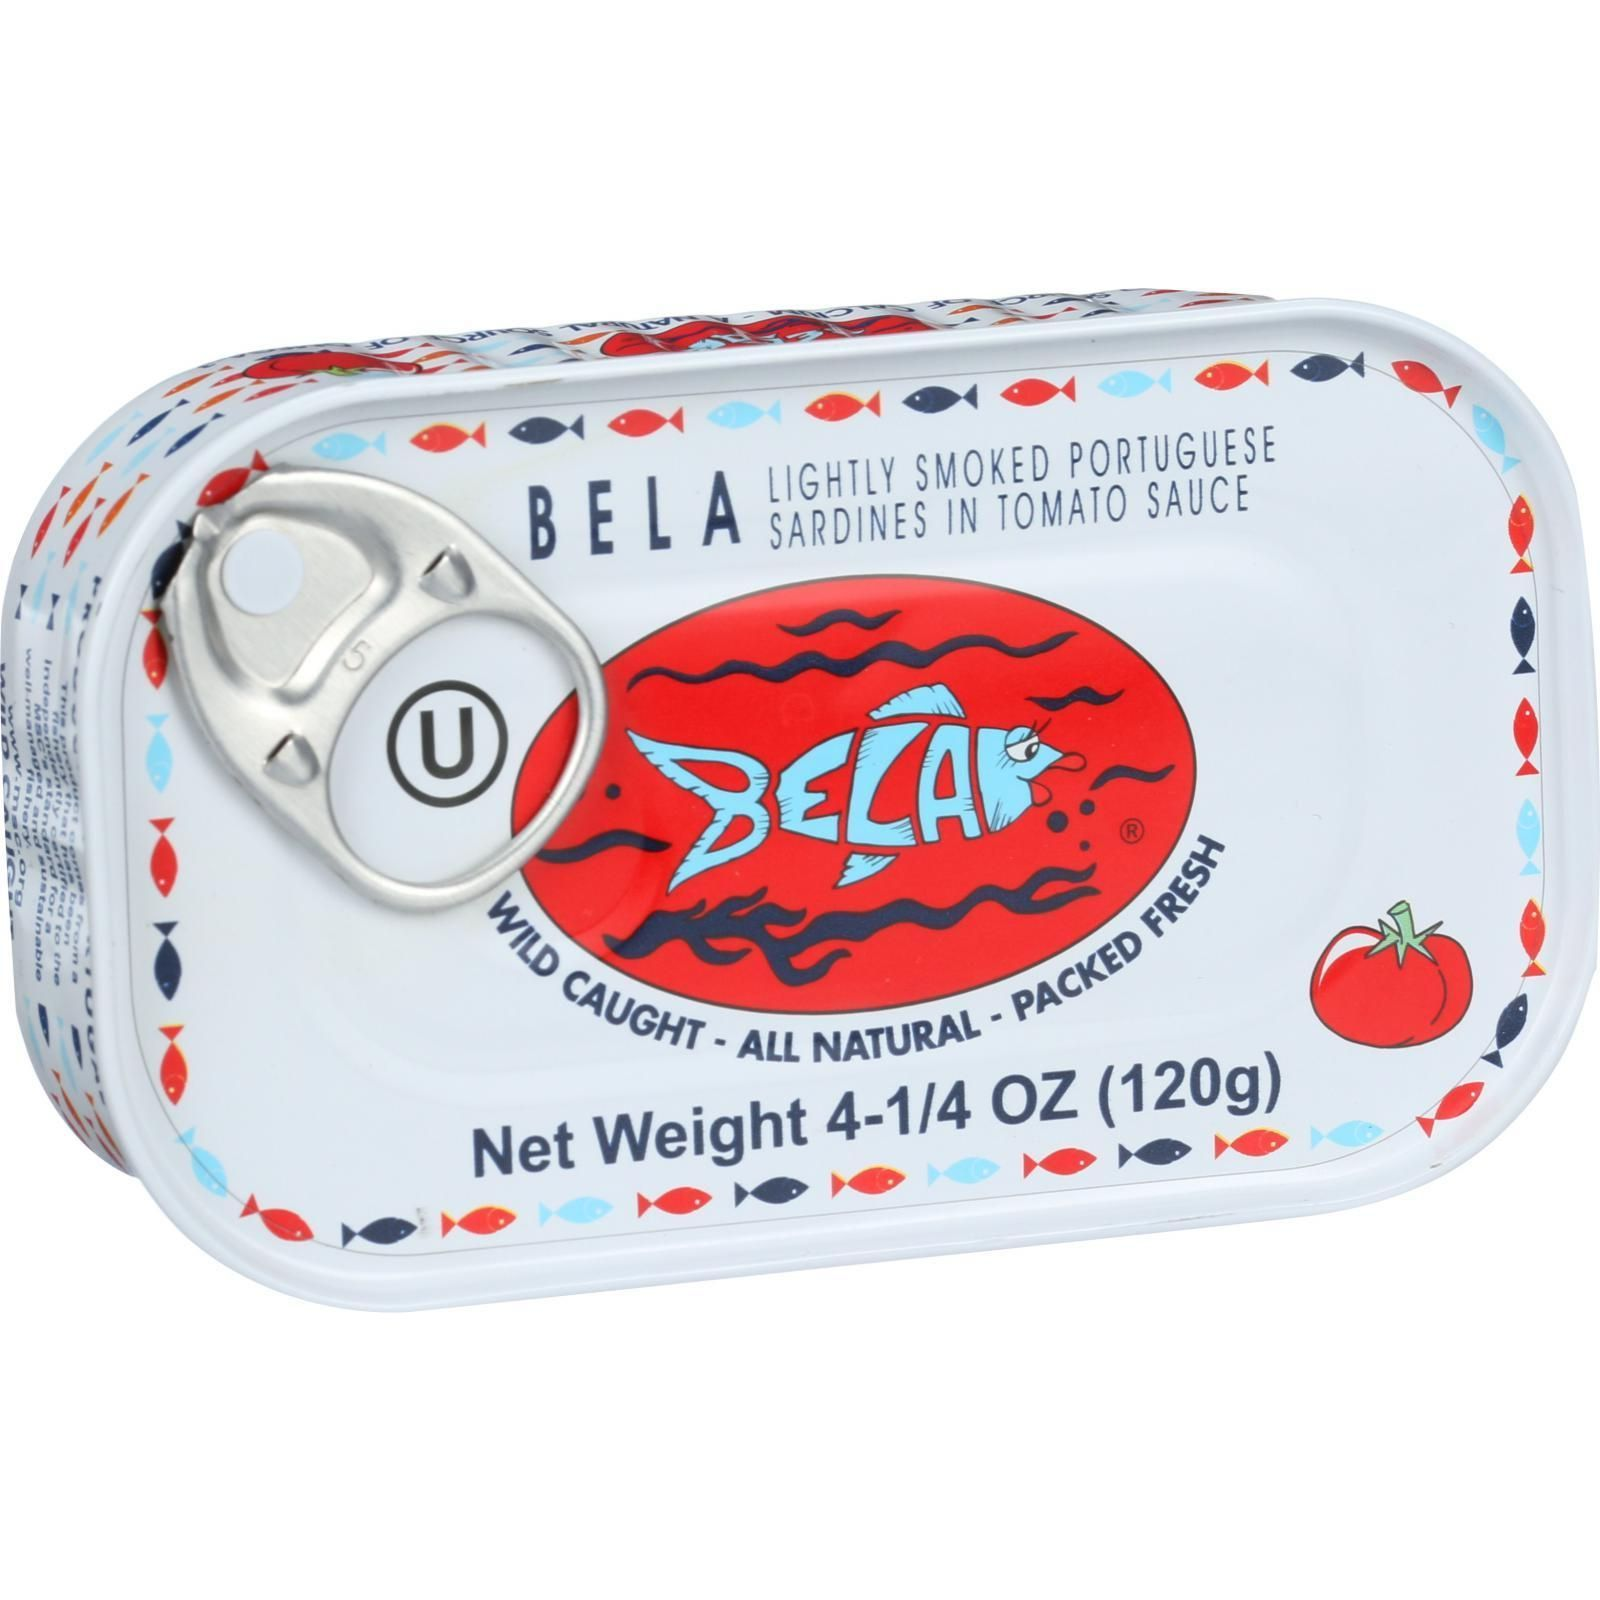 Bela-Olhao Sardines in Tomato Sauce - 4.25 oz - Case of 12